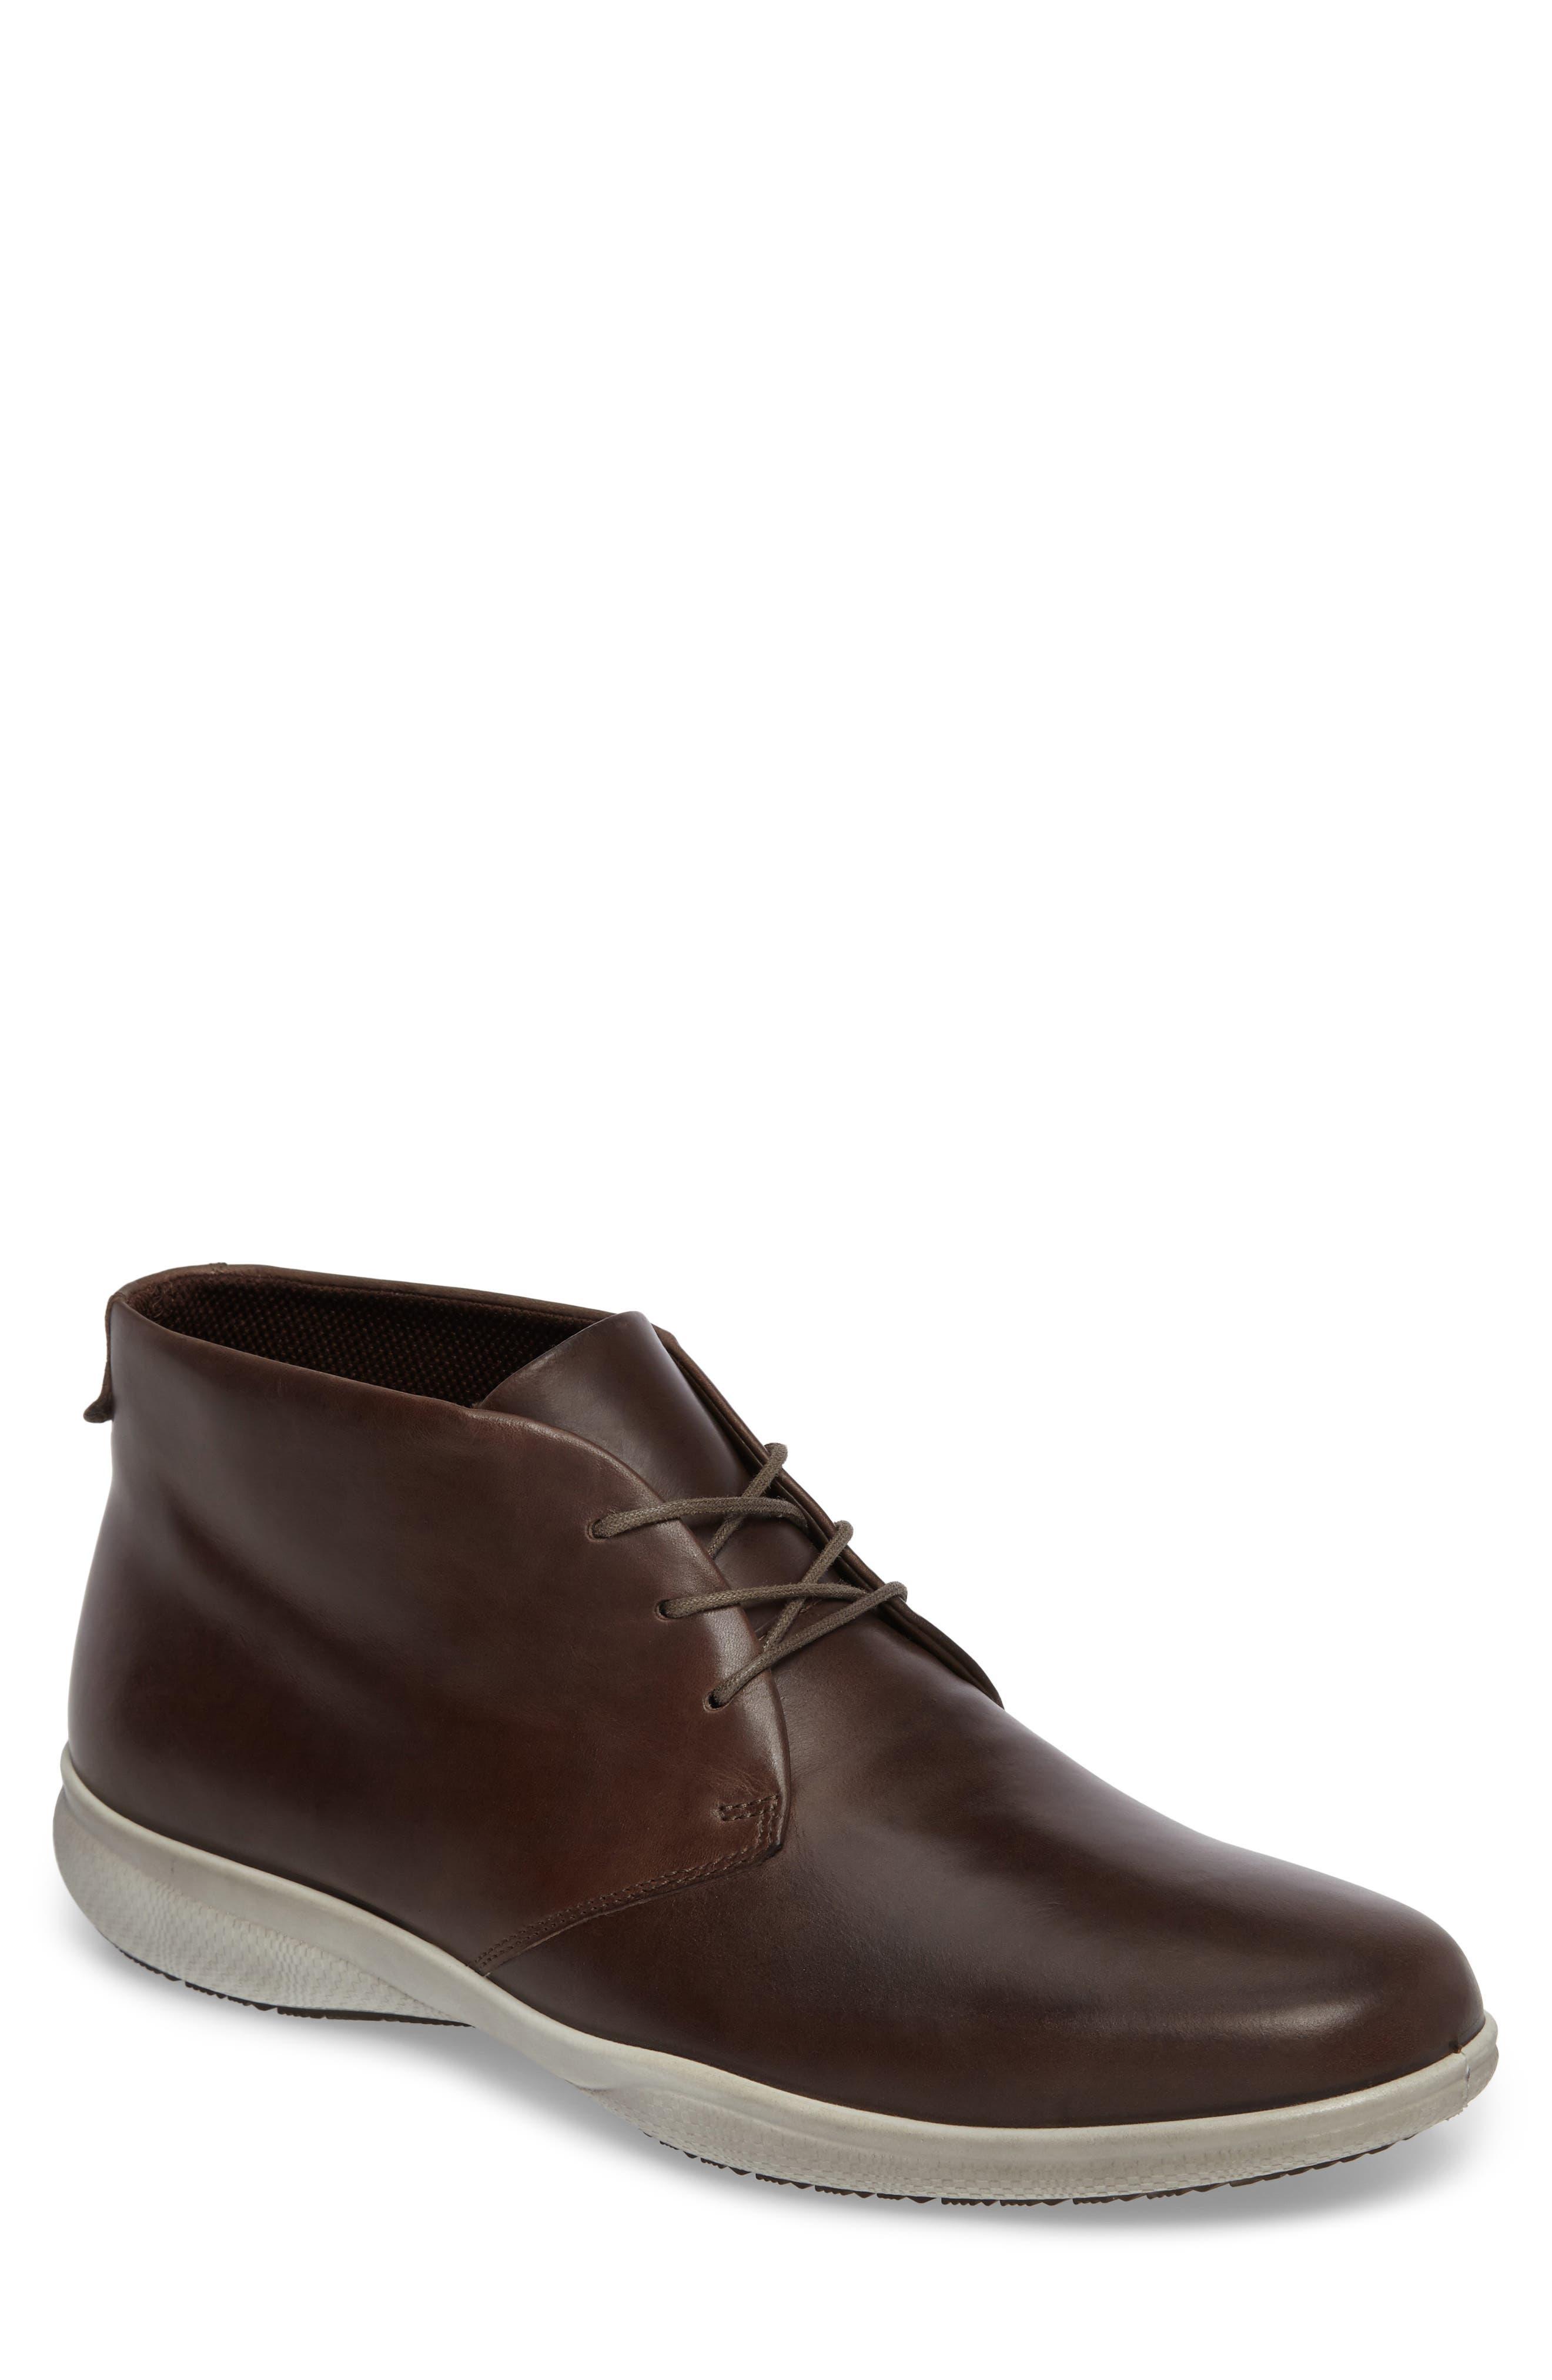 Alternate Image 1 Selected - ECCO 'Grenoble' Chukka Boot (Men)